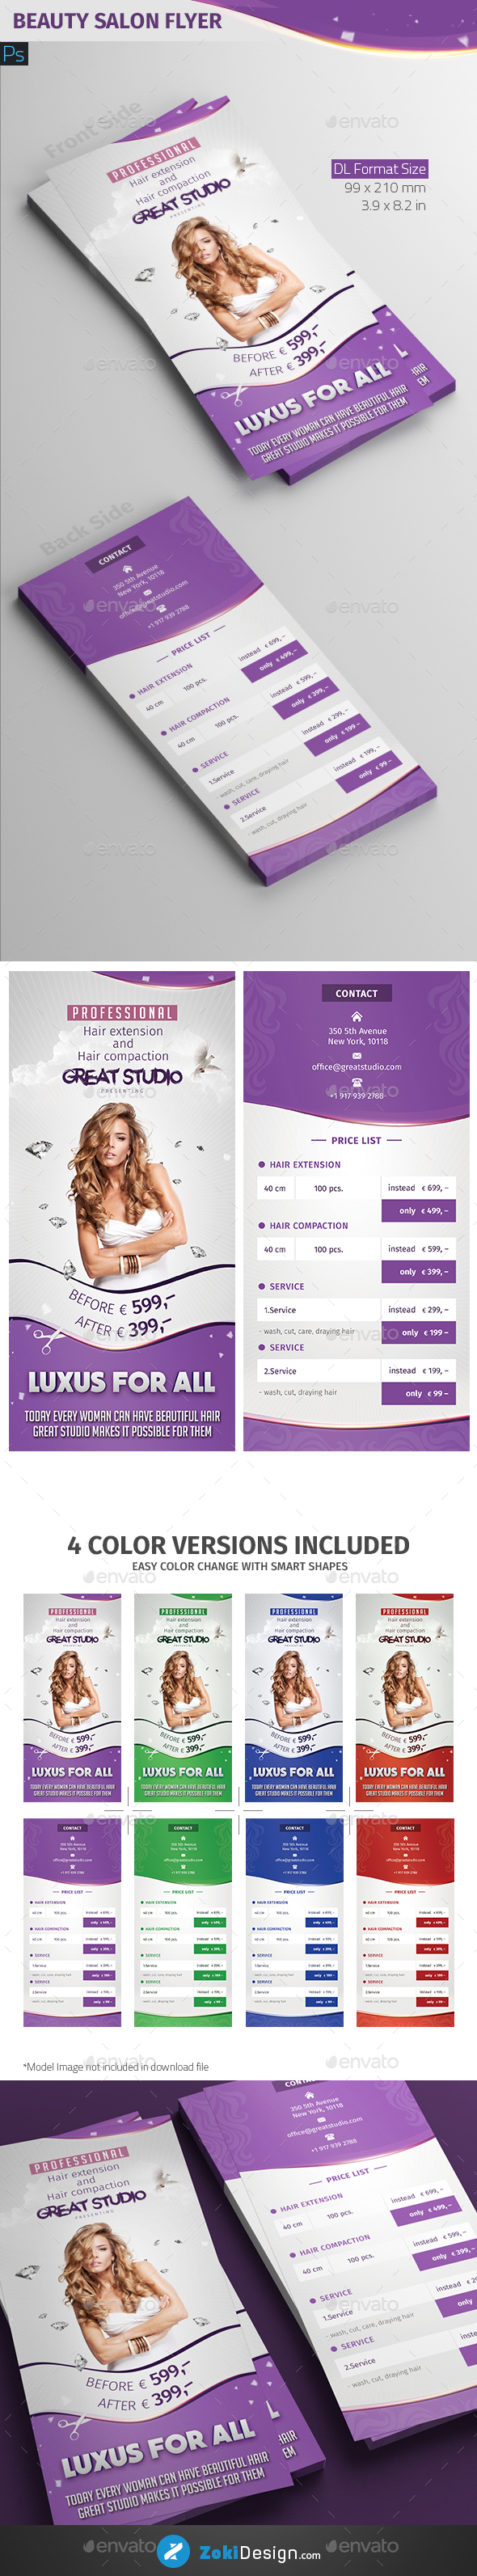 Beauty Salon Flyer - Corporate Flyers